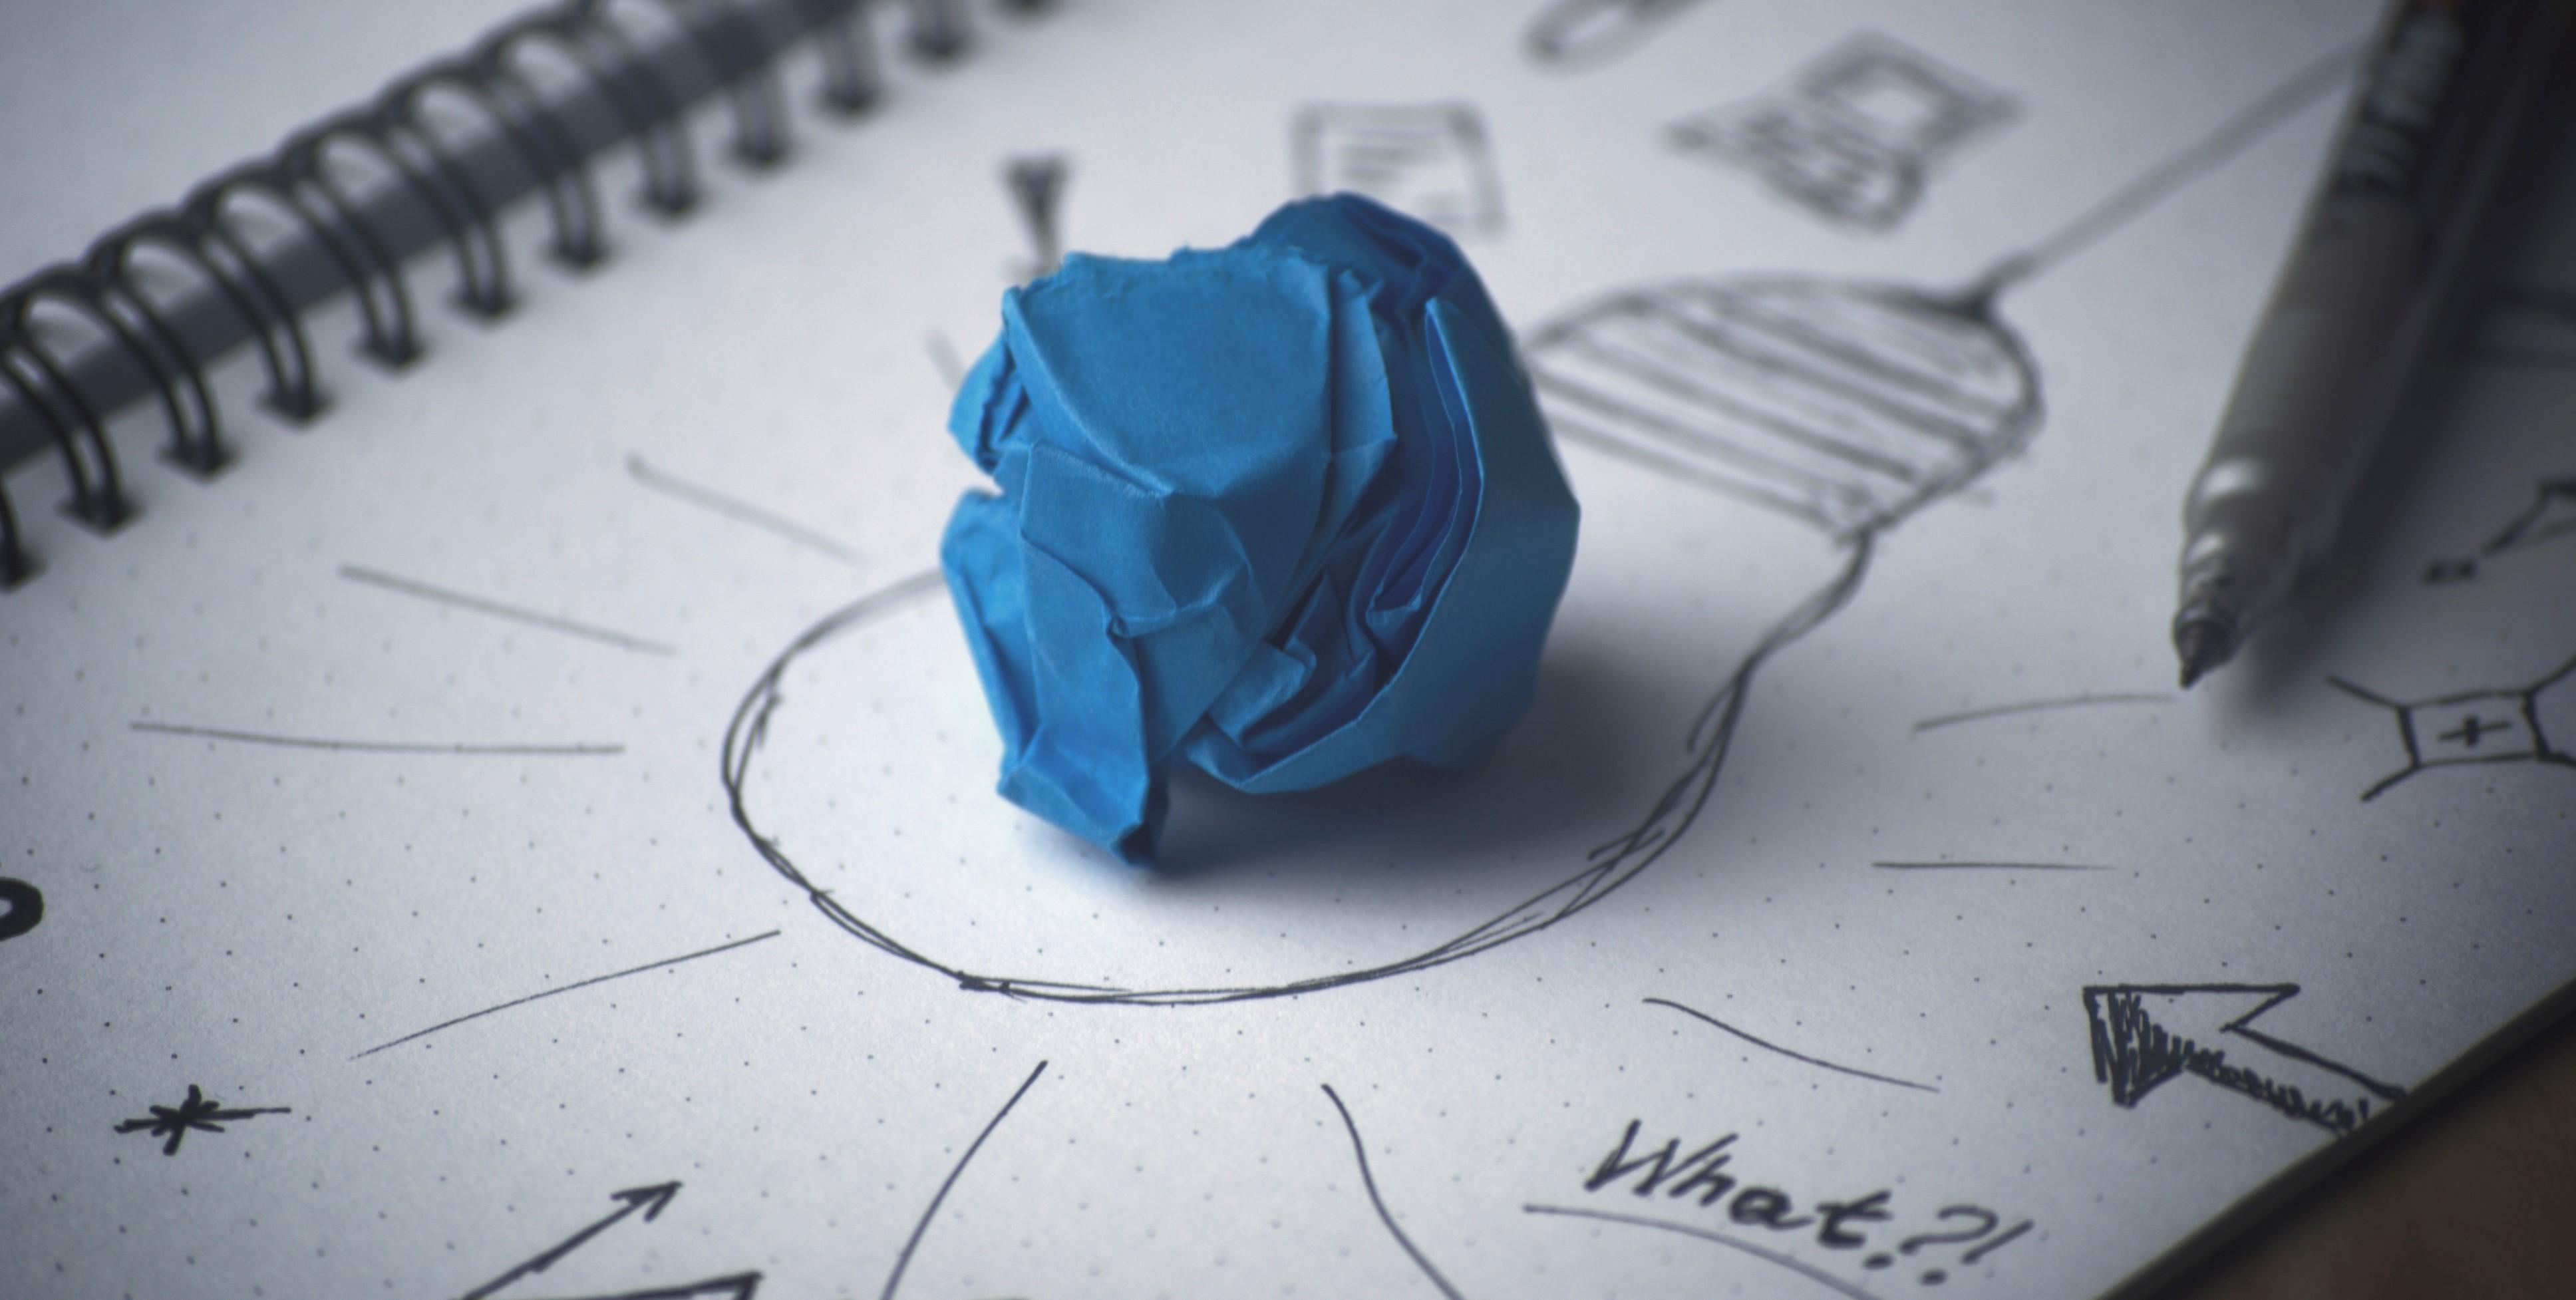 pen-idea-bulb-paper-1.jpg